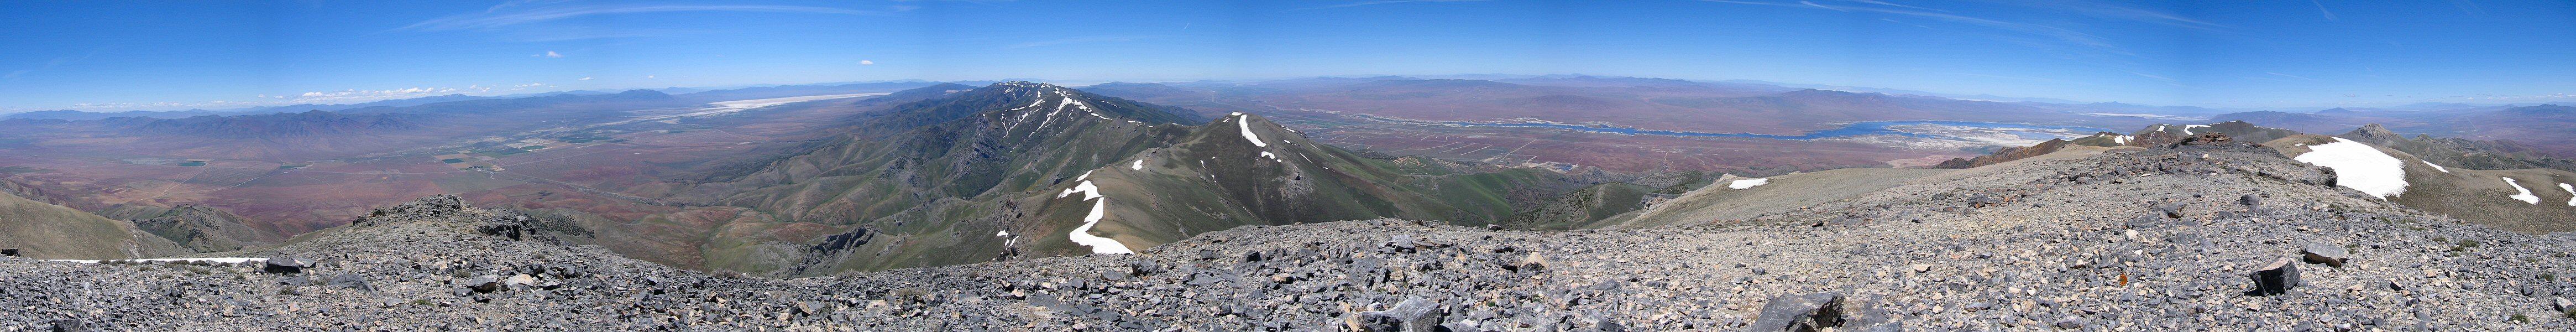 Star Peak